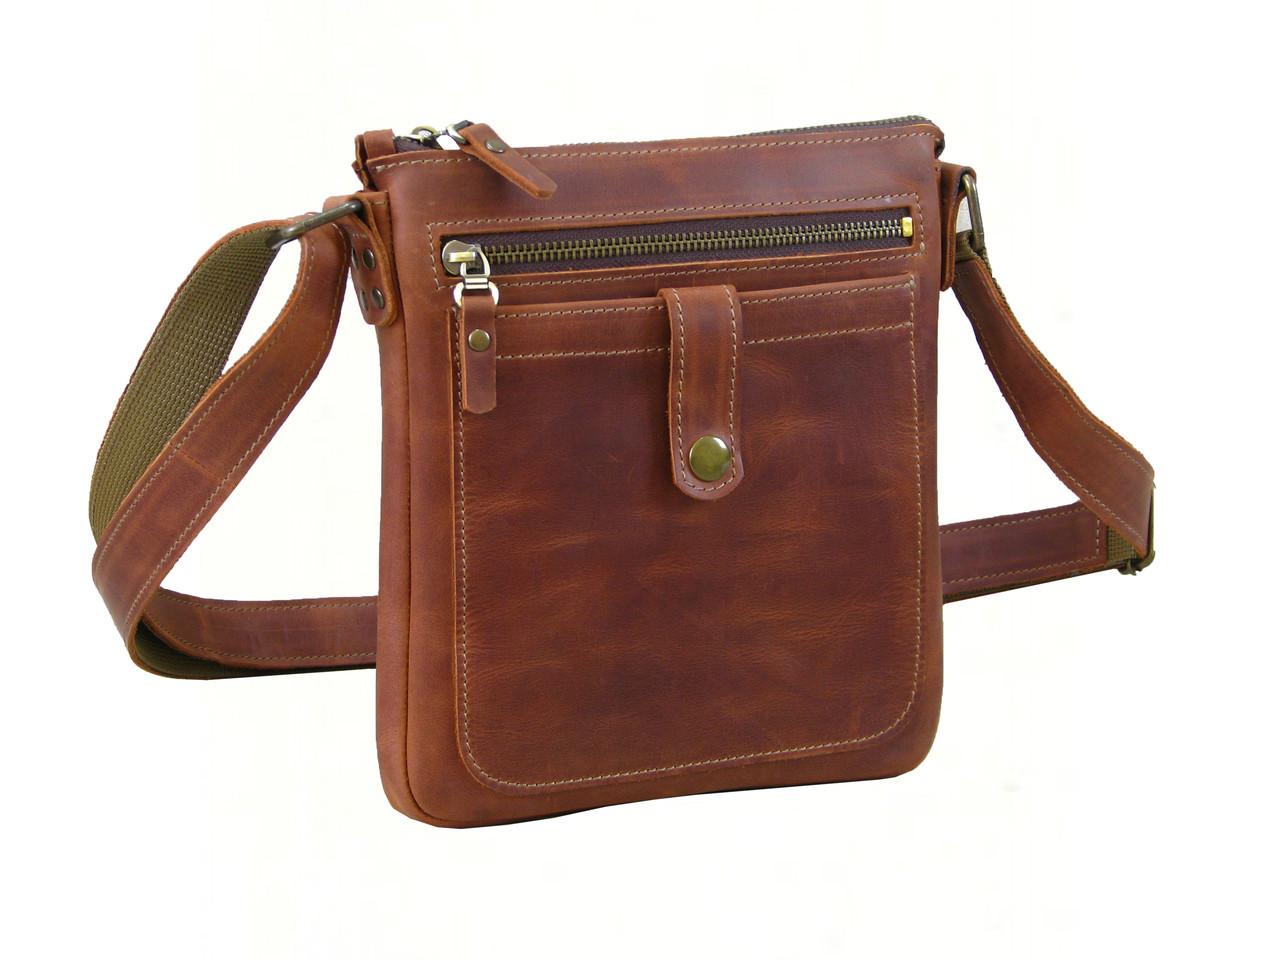 Кожаная сумка планшет GS мужская коньячная рыжая